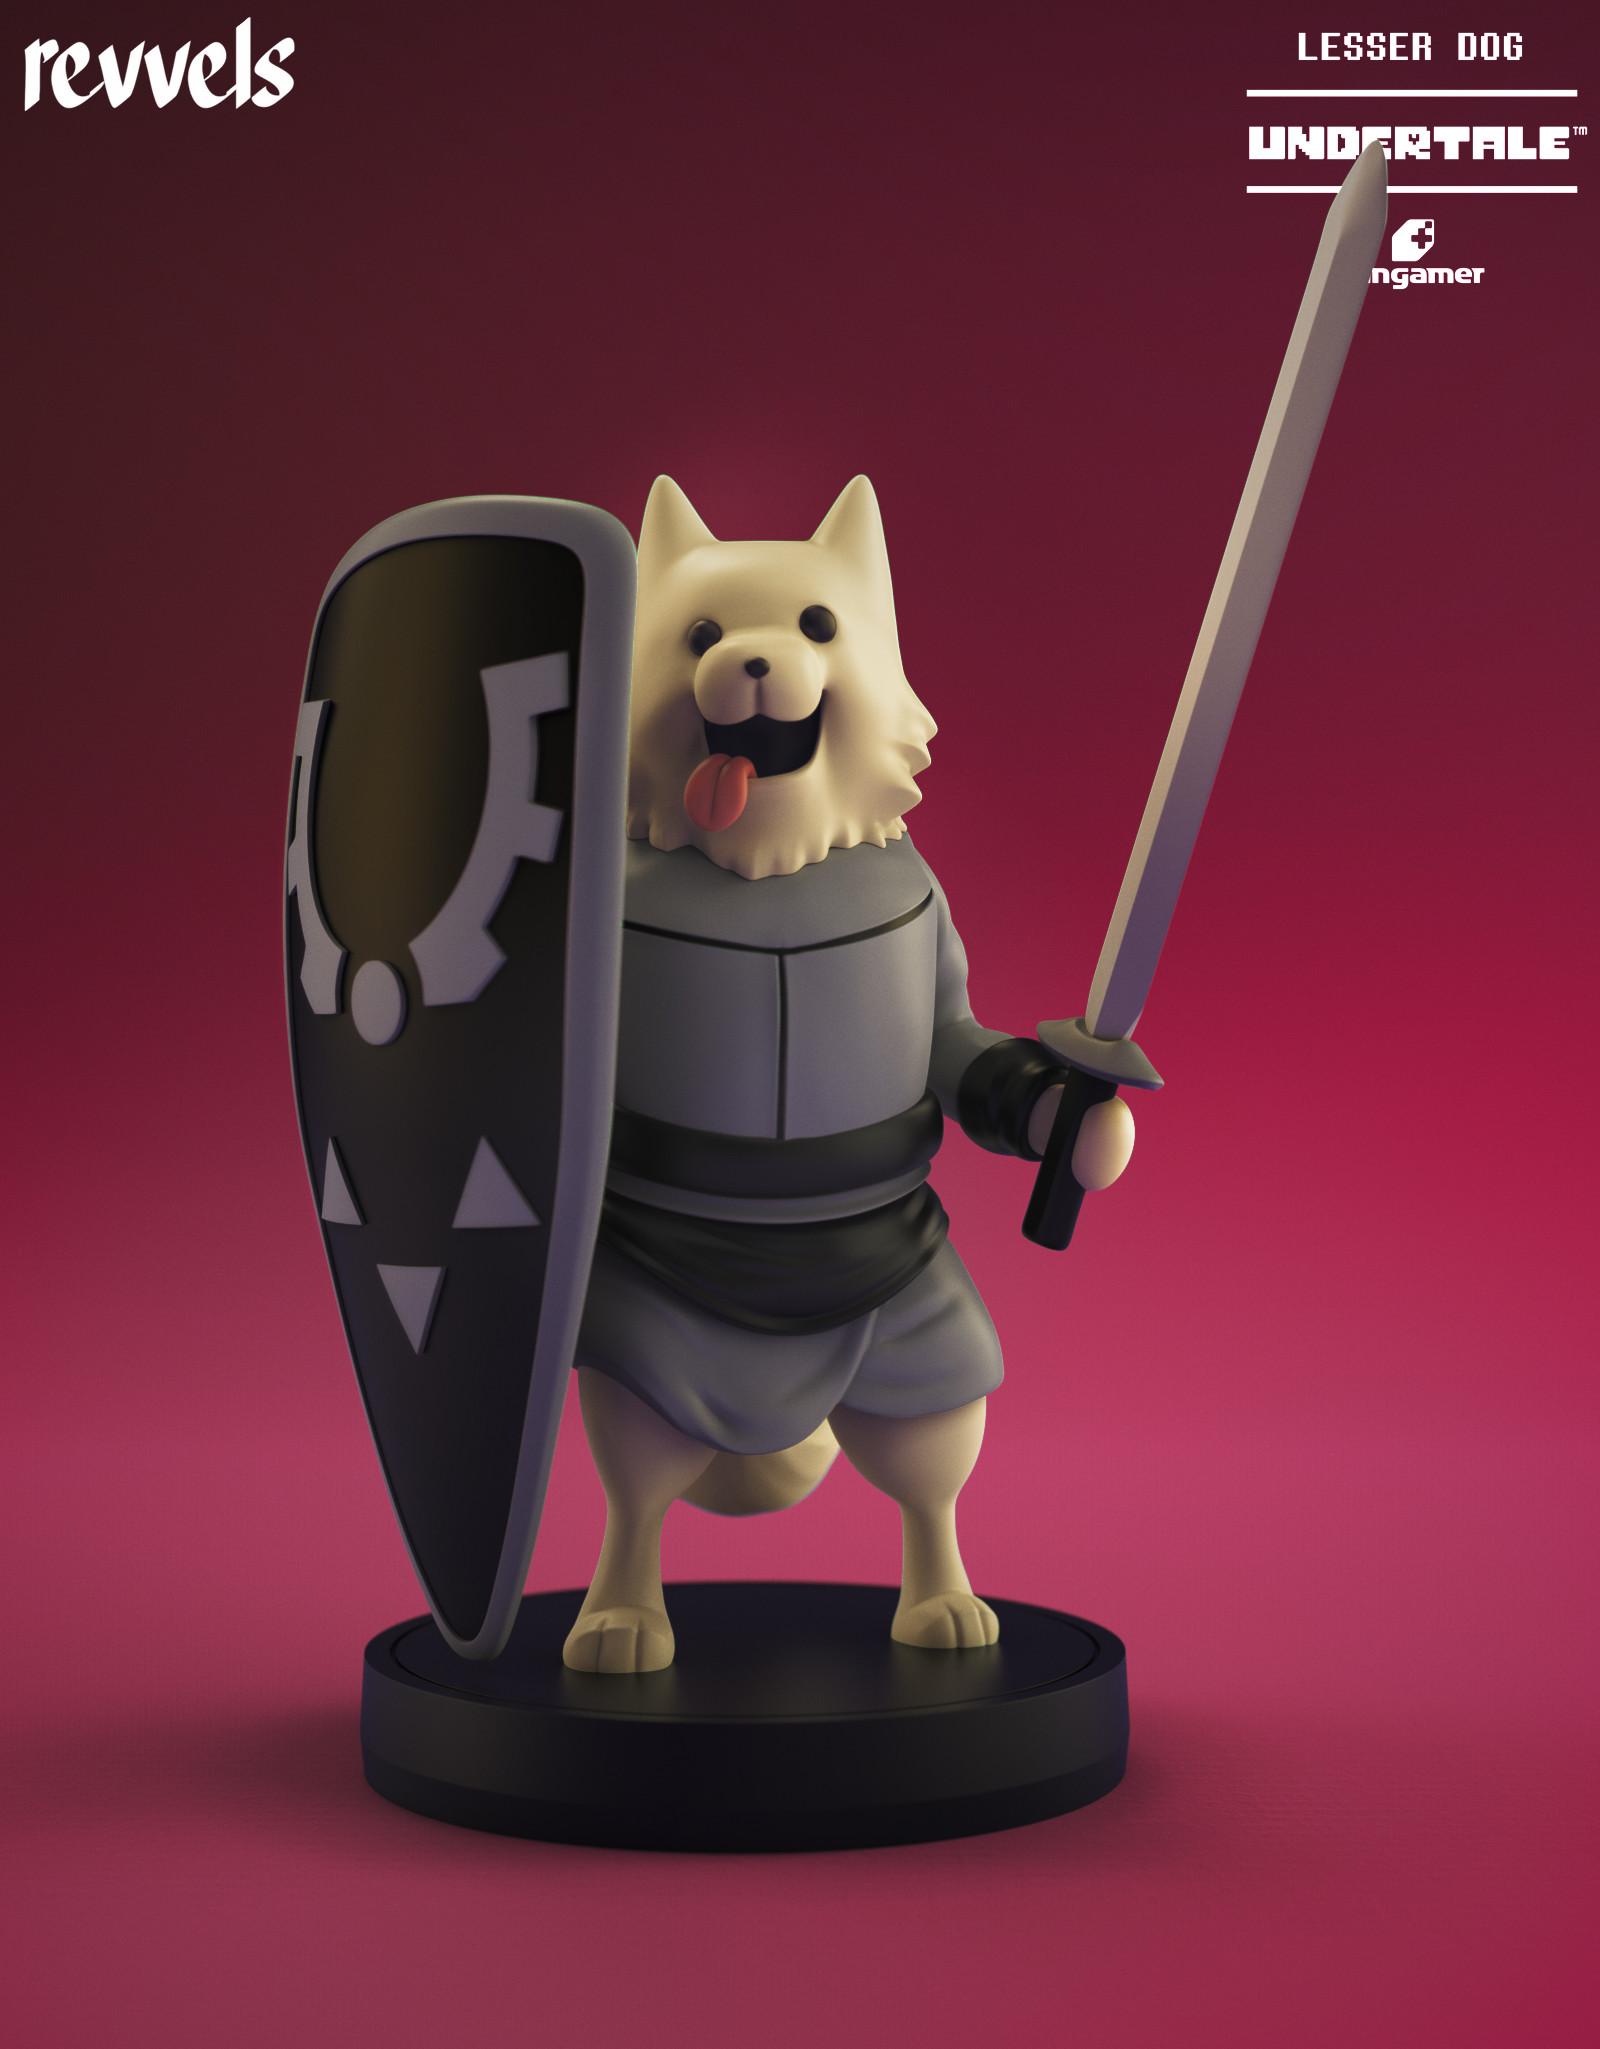 Gijs revvels van kooten lesserdog hero v02 1050